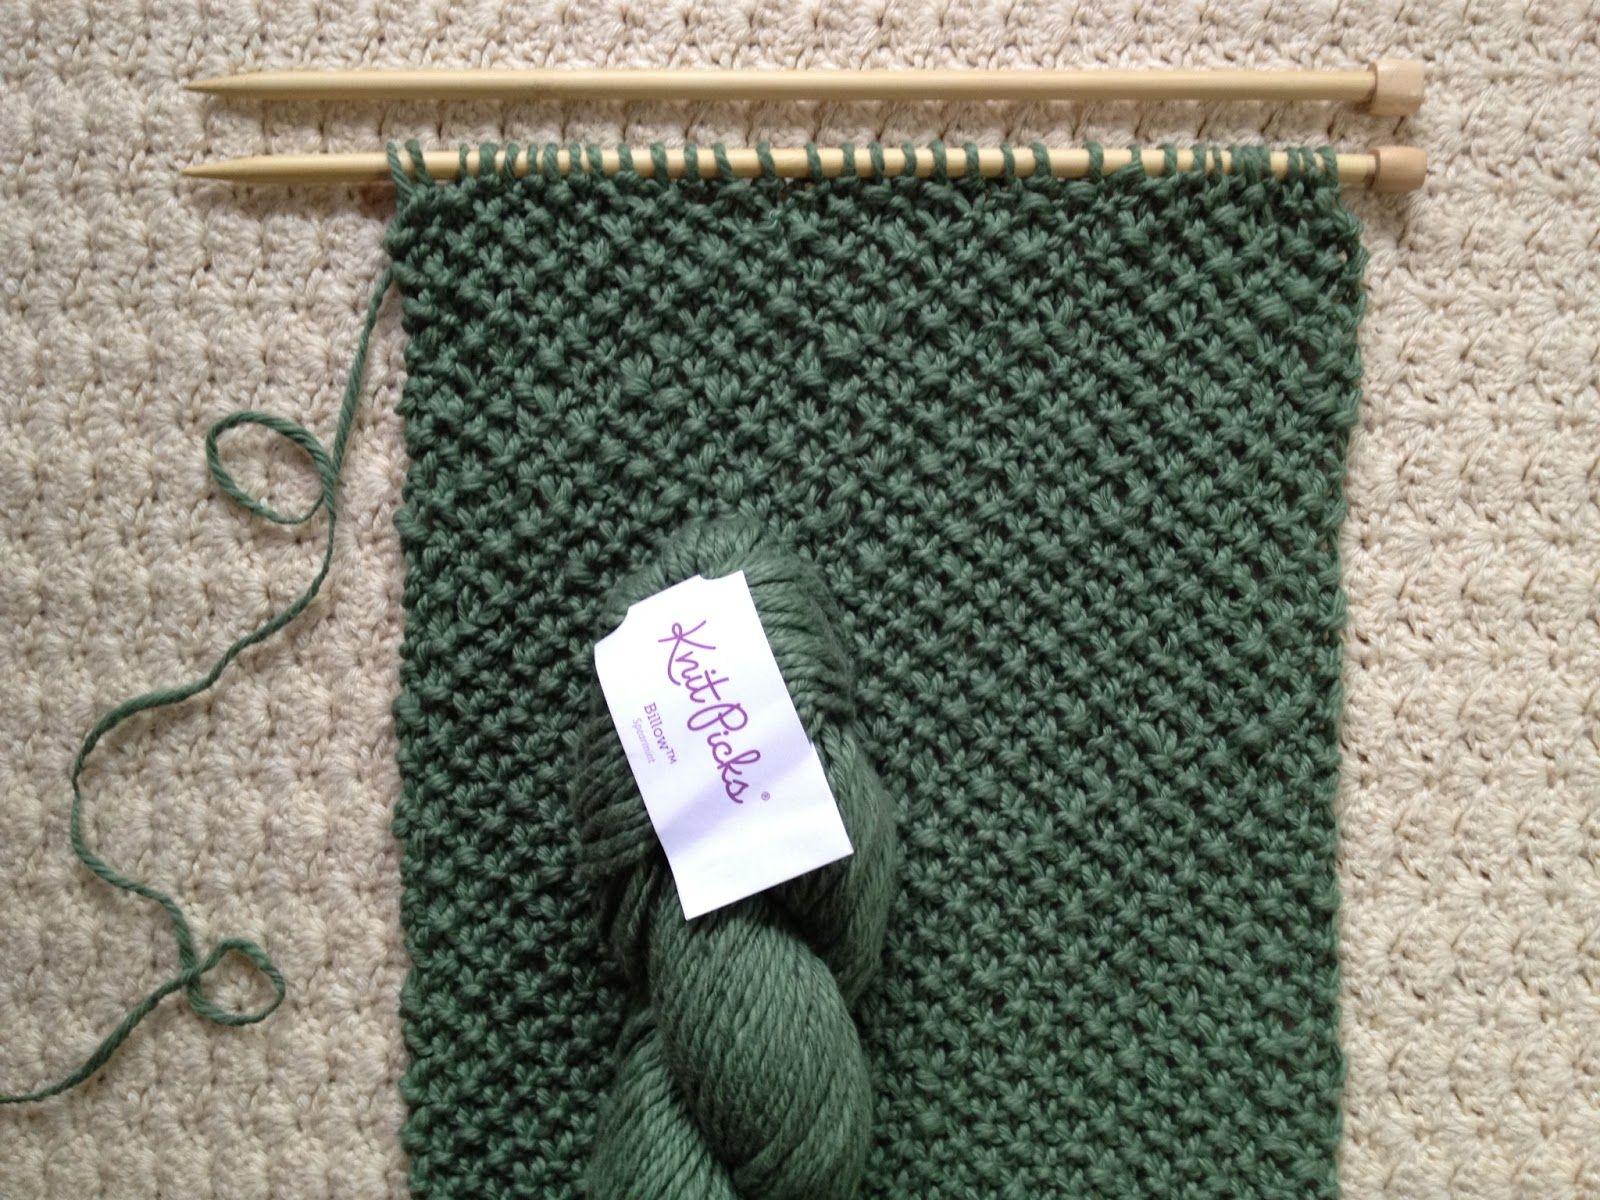 Infinity Scarf Knitting Pattern Beginner   FREE INFINITY SCARF ...